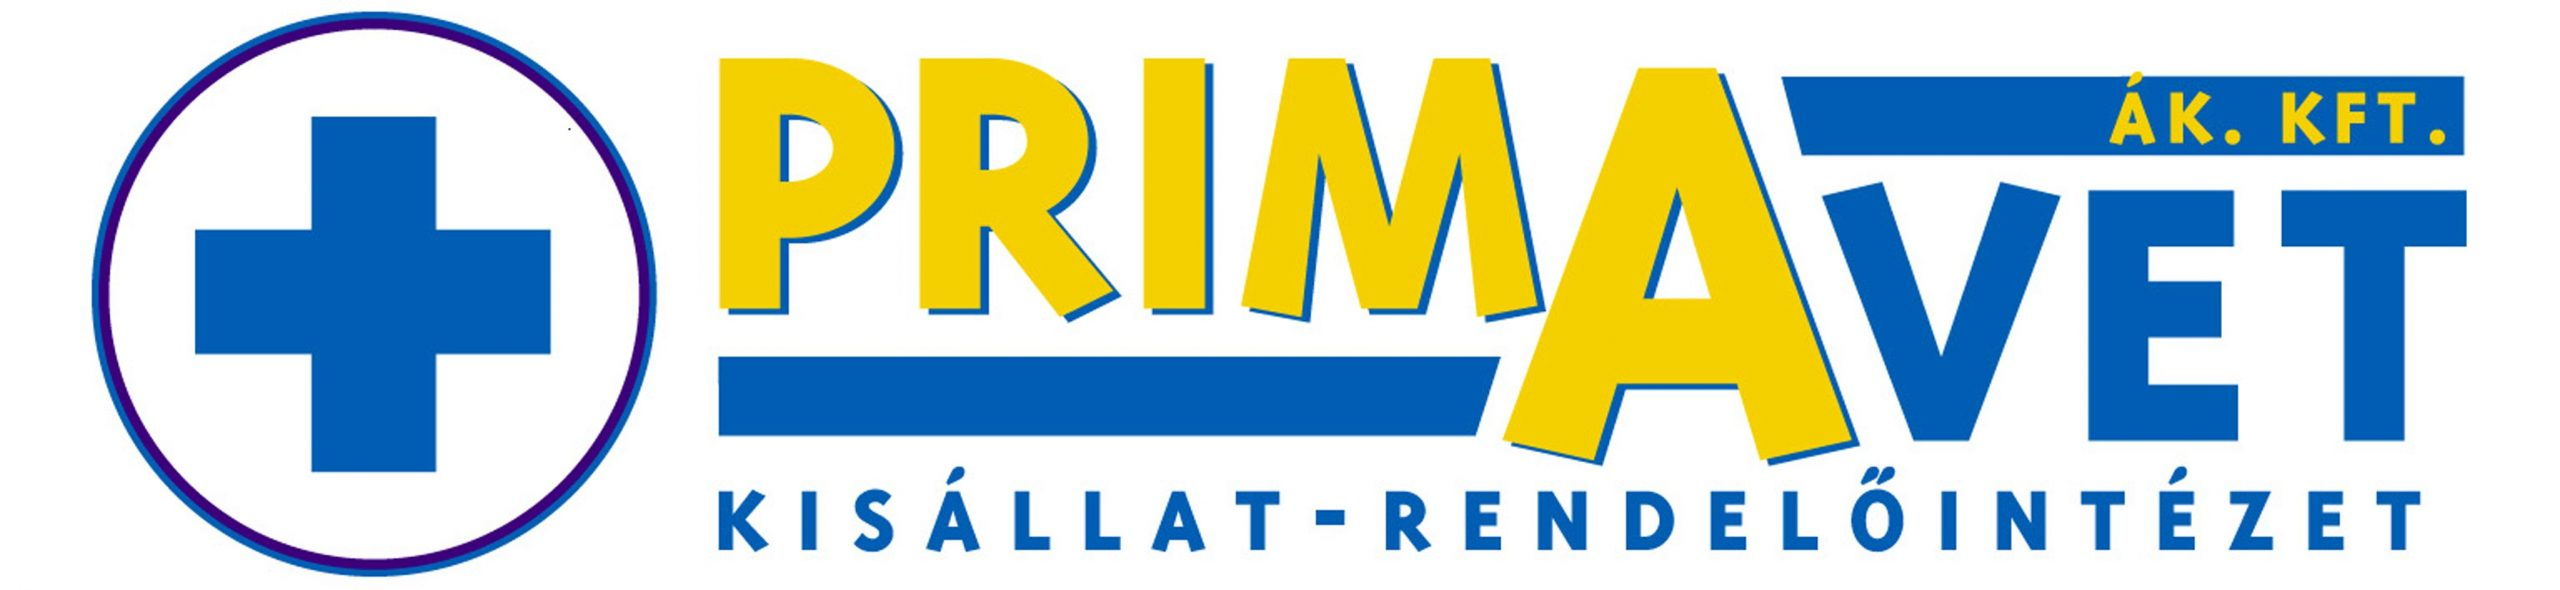 Primavet-logo